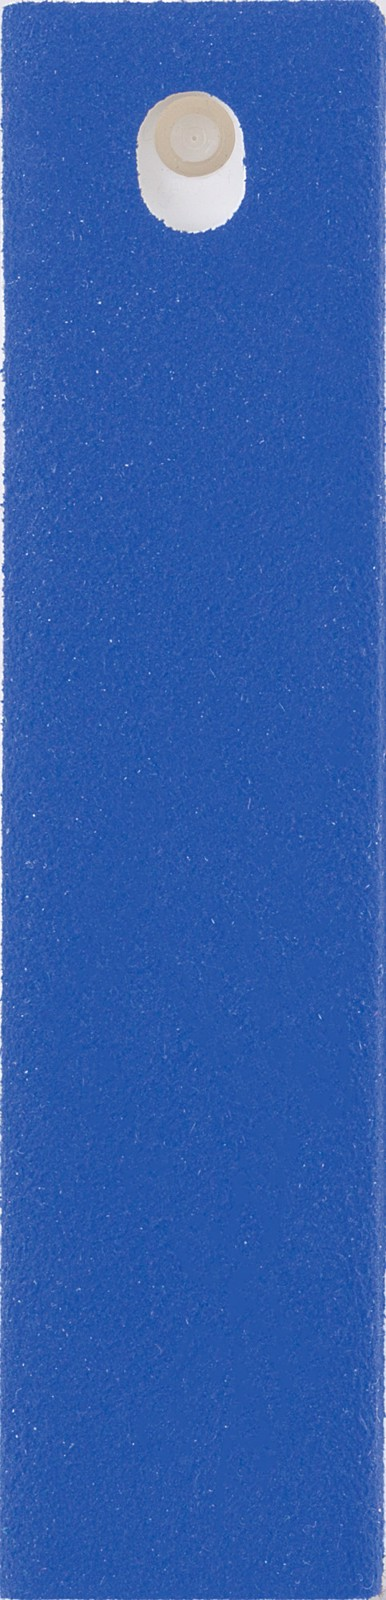 PP screen cleaner spray - Cobalt Blue